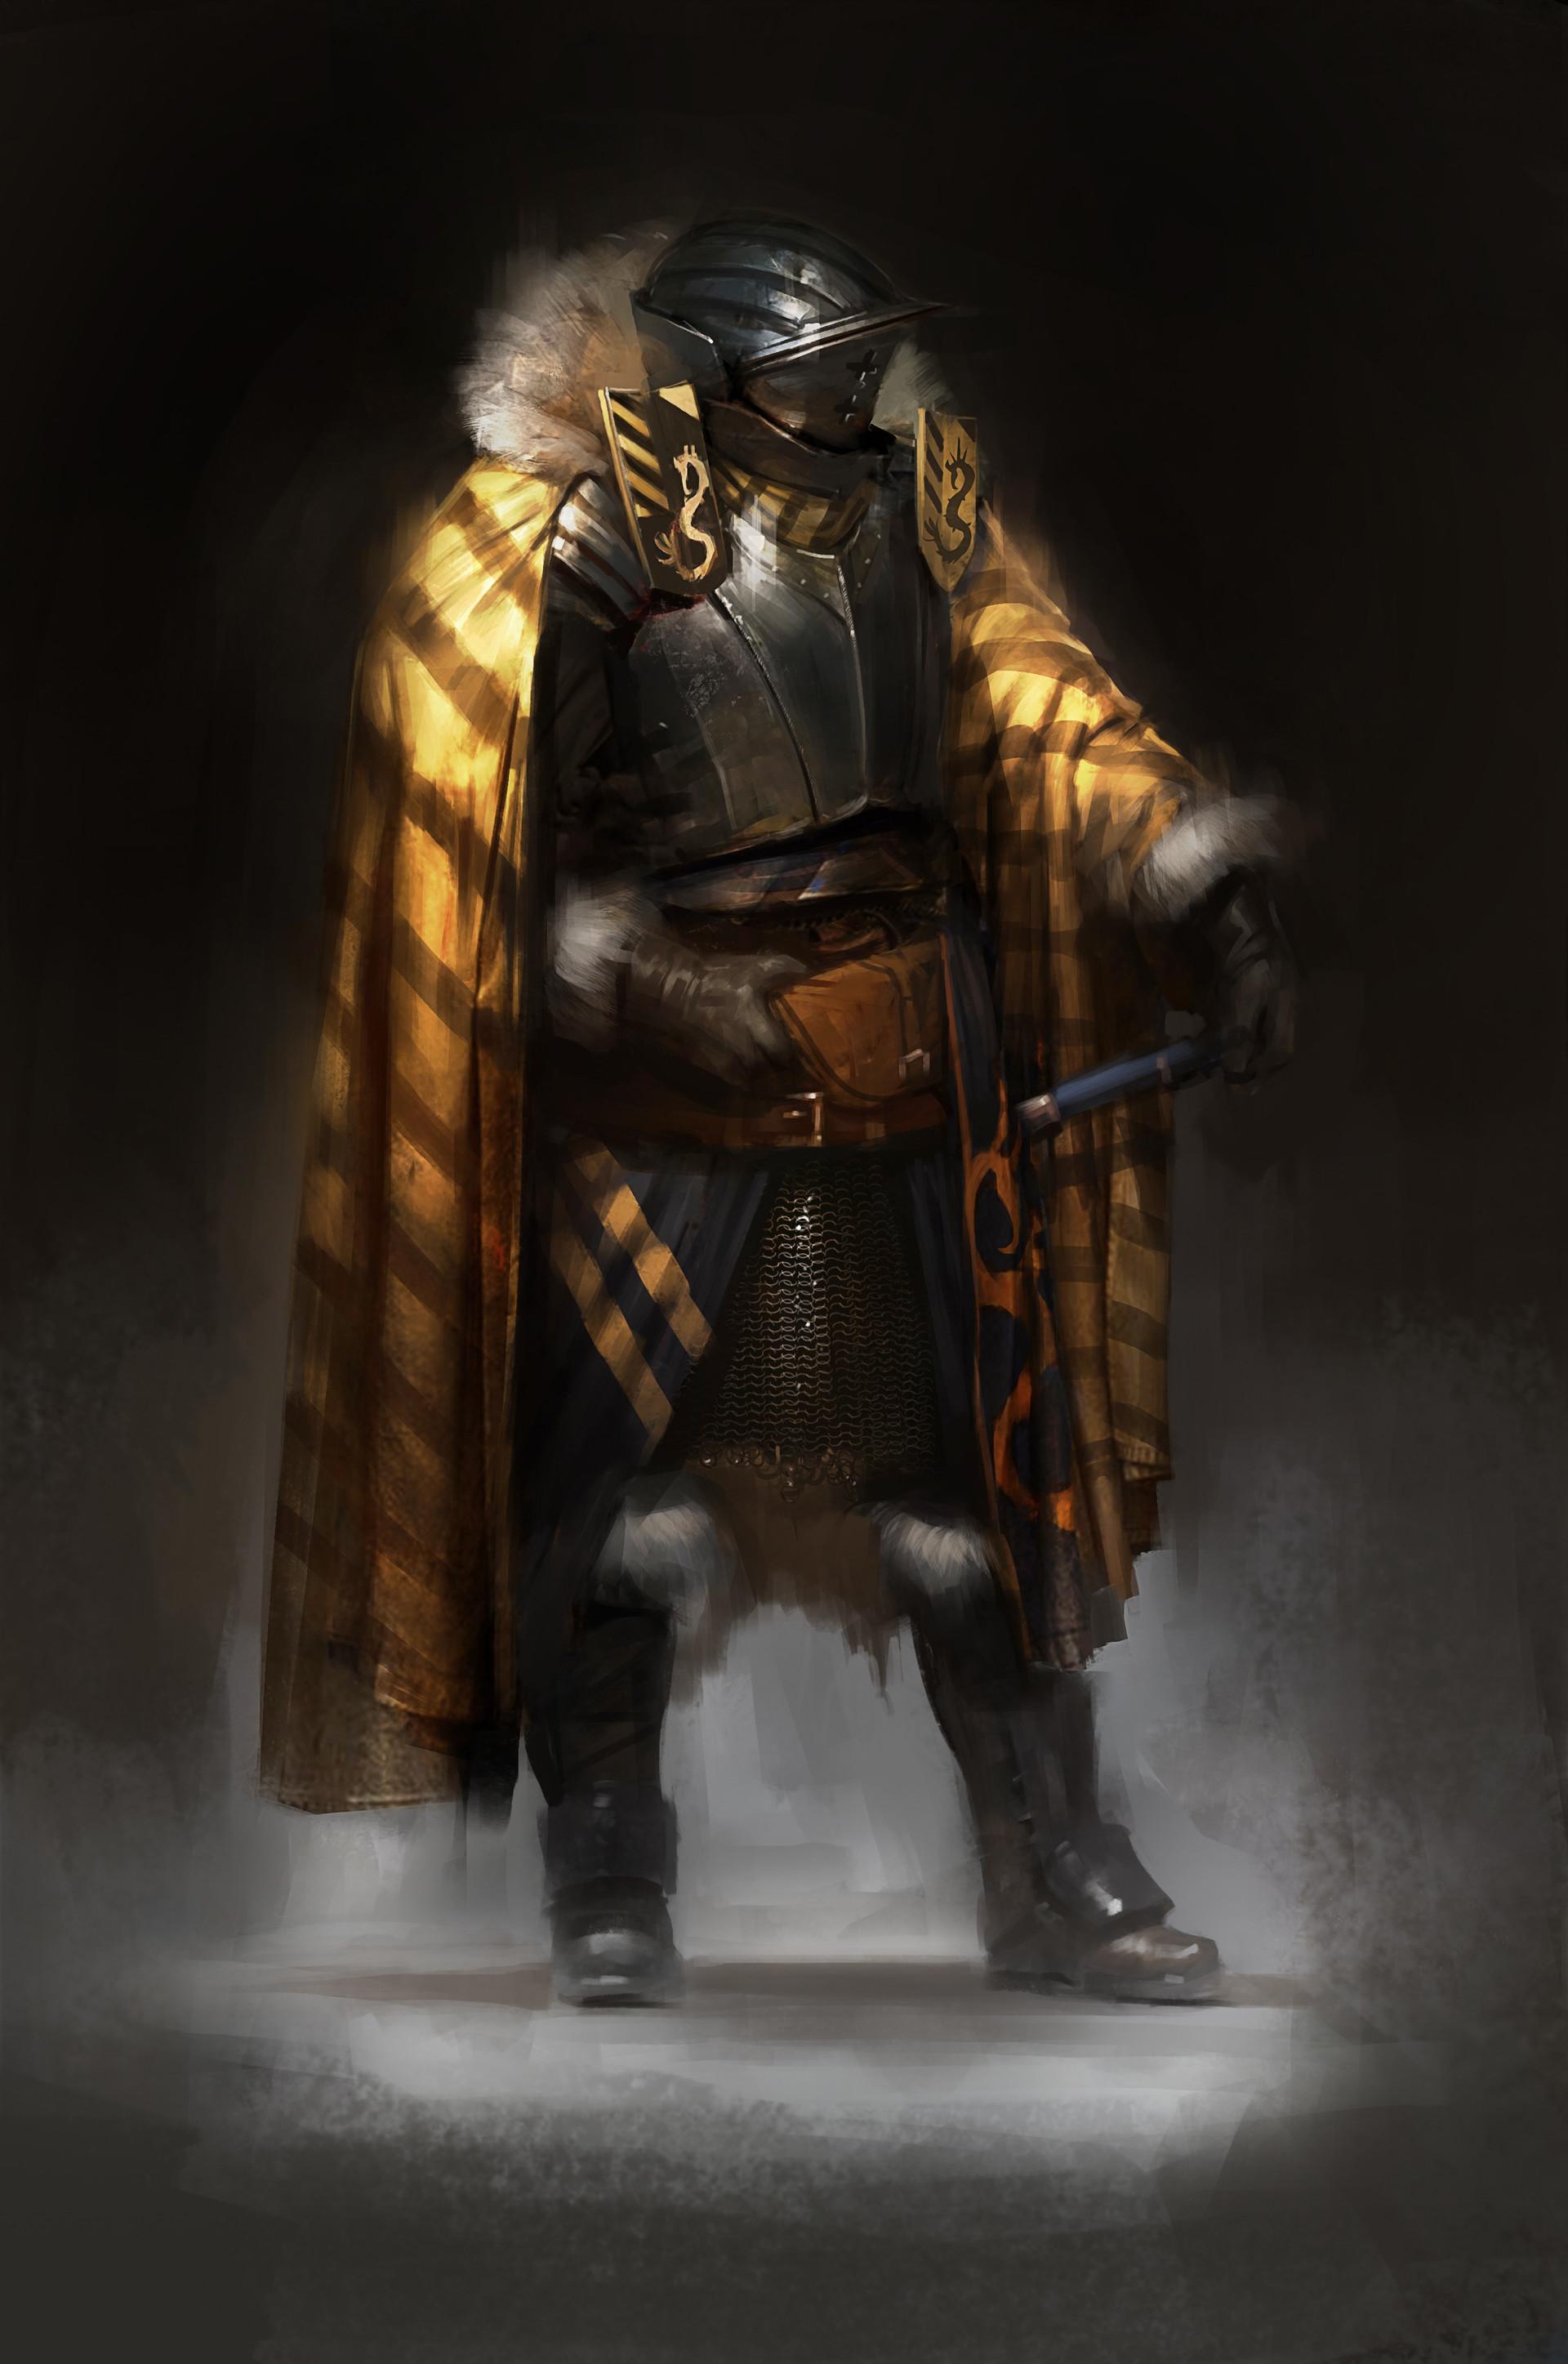 Pierre raveneau knight2 by asahisuperdry daz4c3r